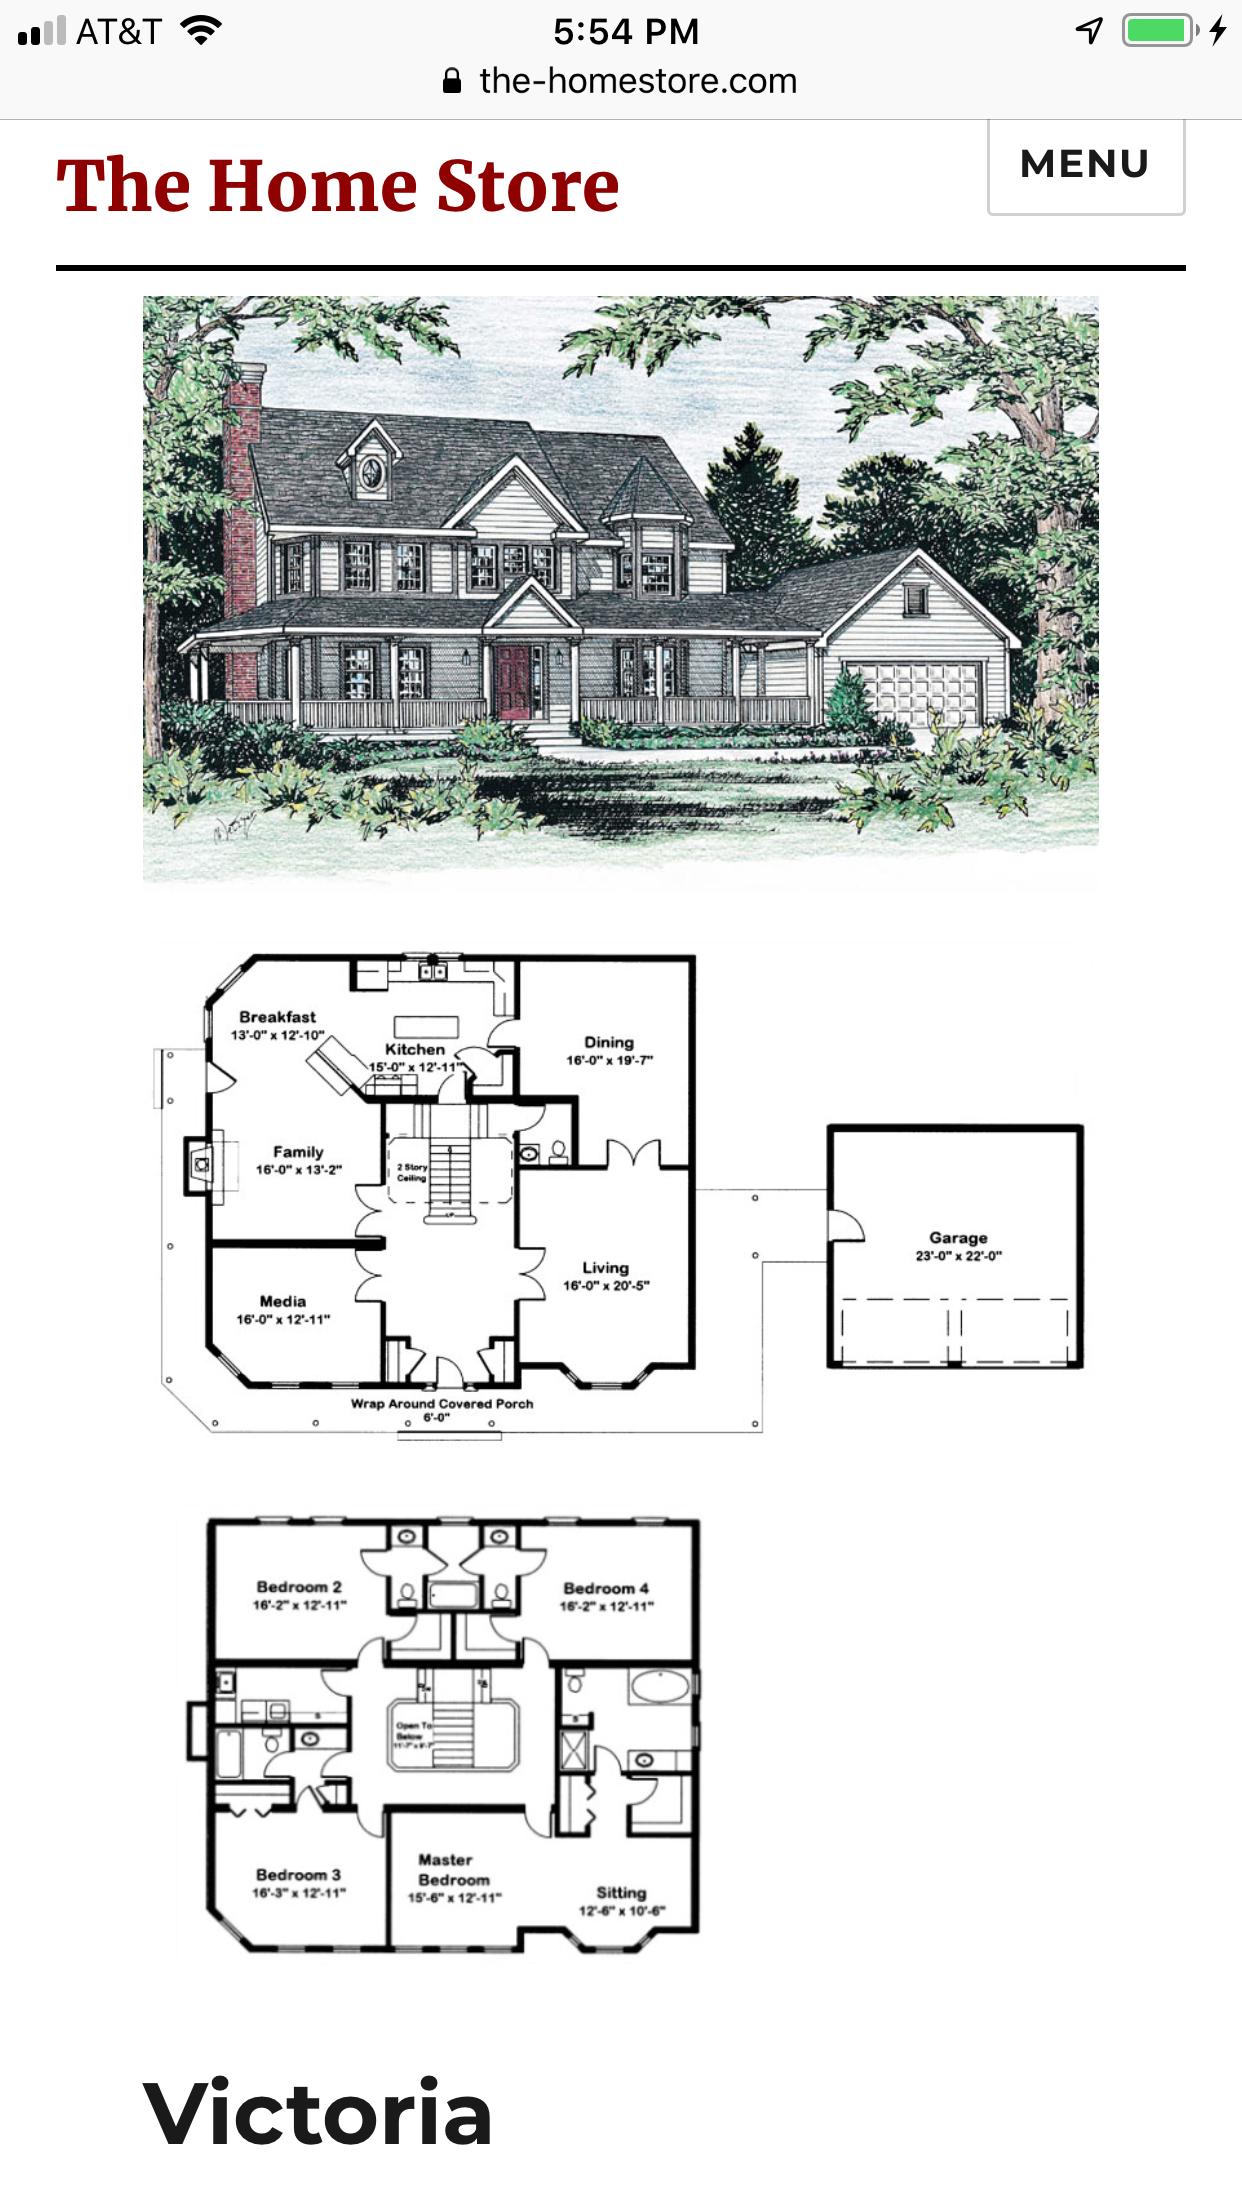 Pin By Annika Leogrande On Modular Homes Plans In 2020 Modular Home Plans House Plans Modular Homes